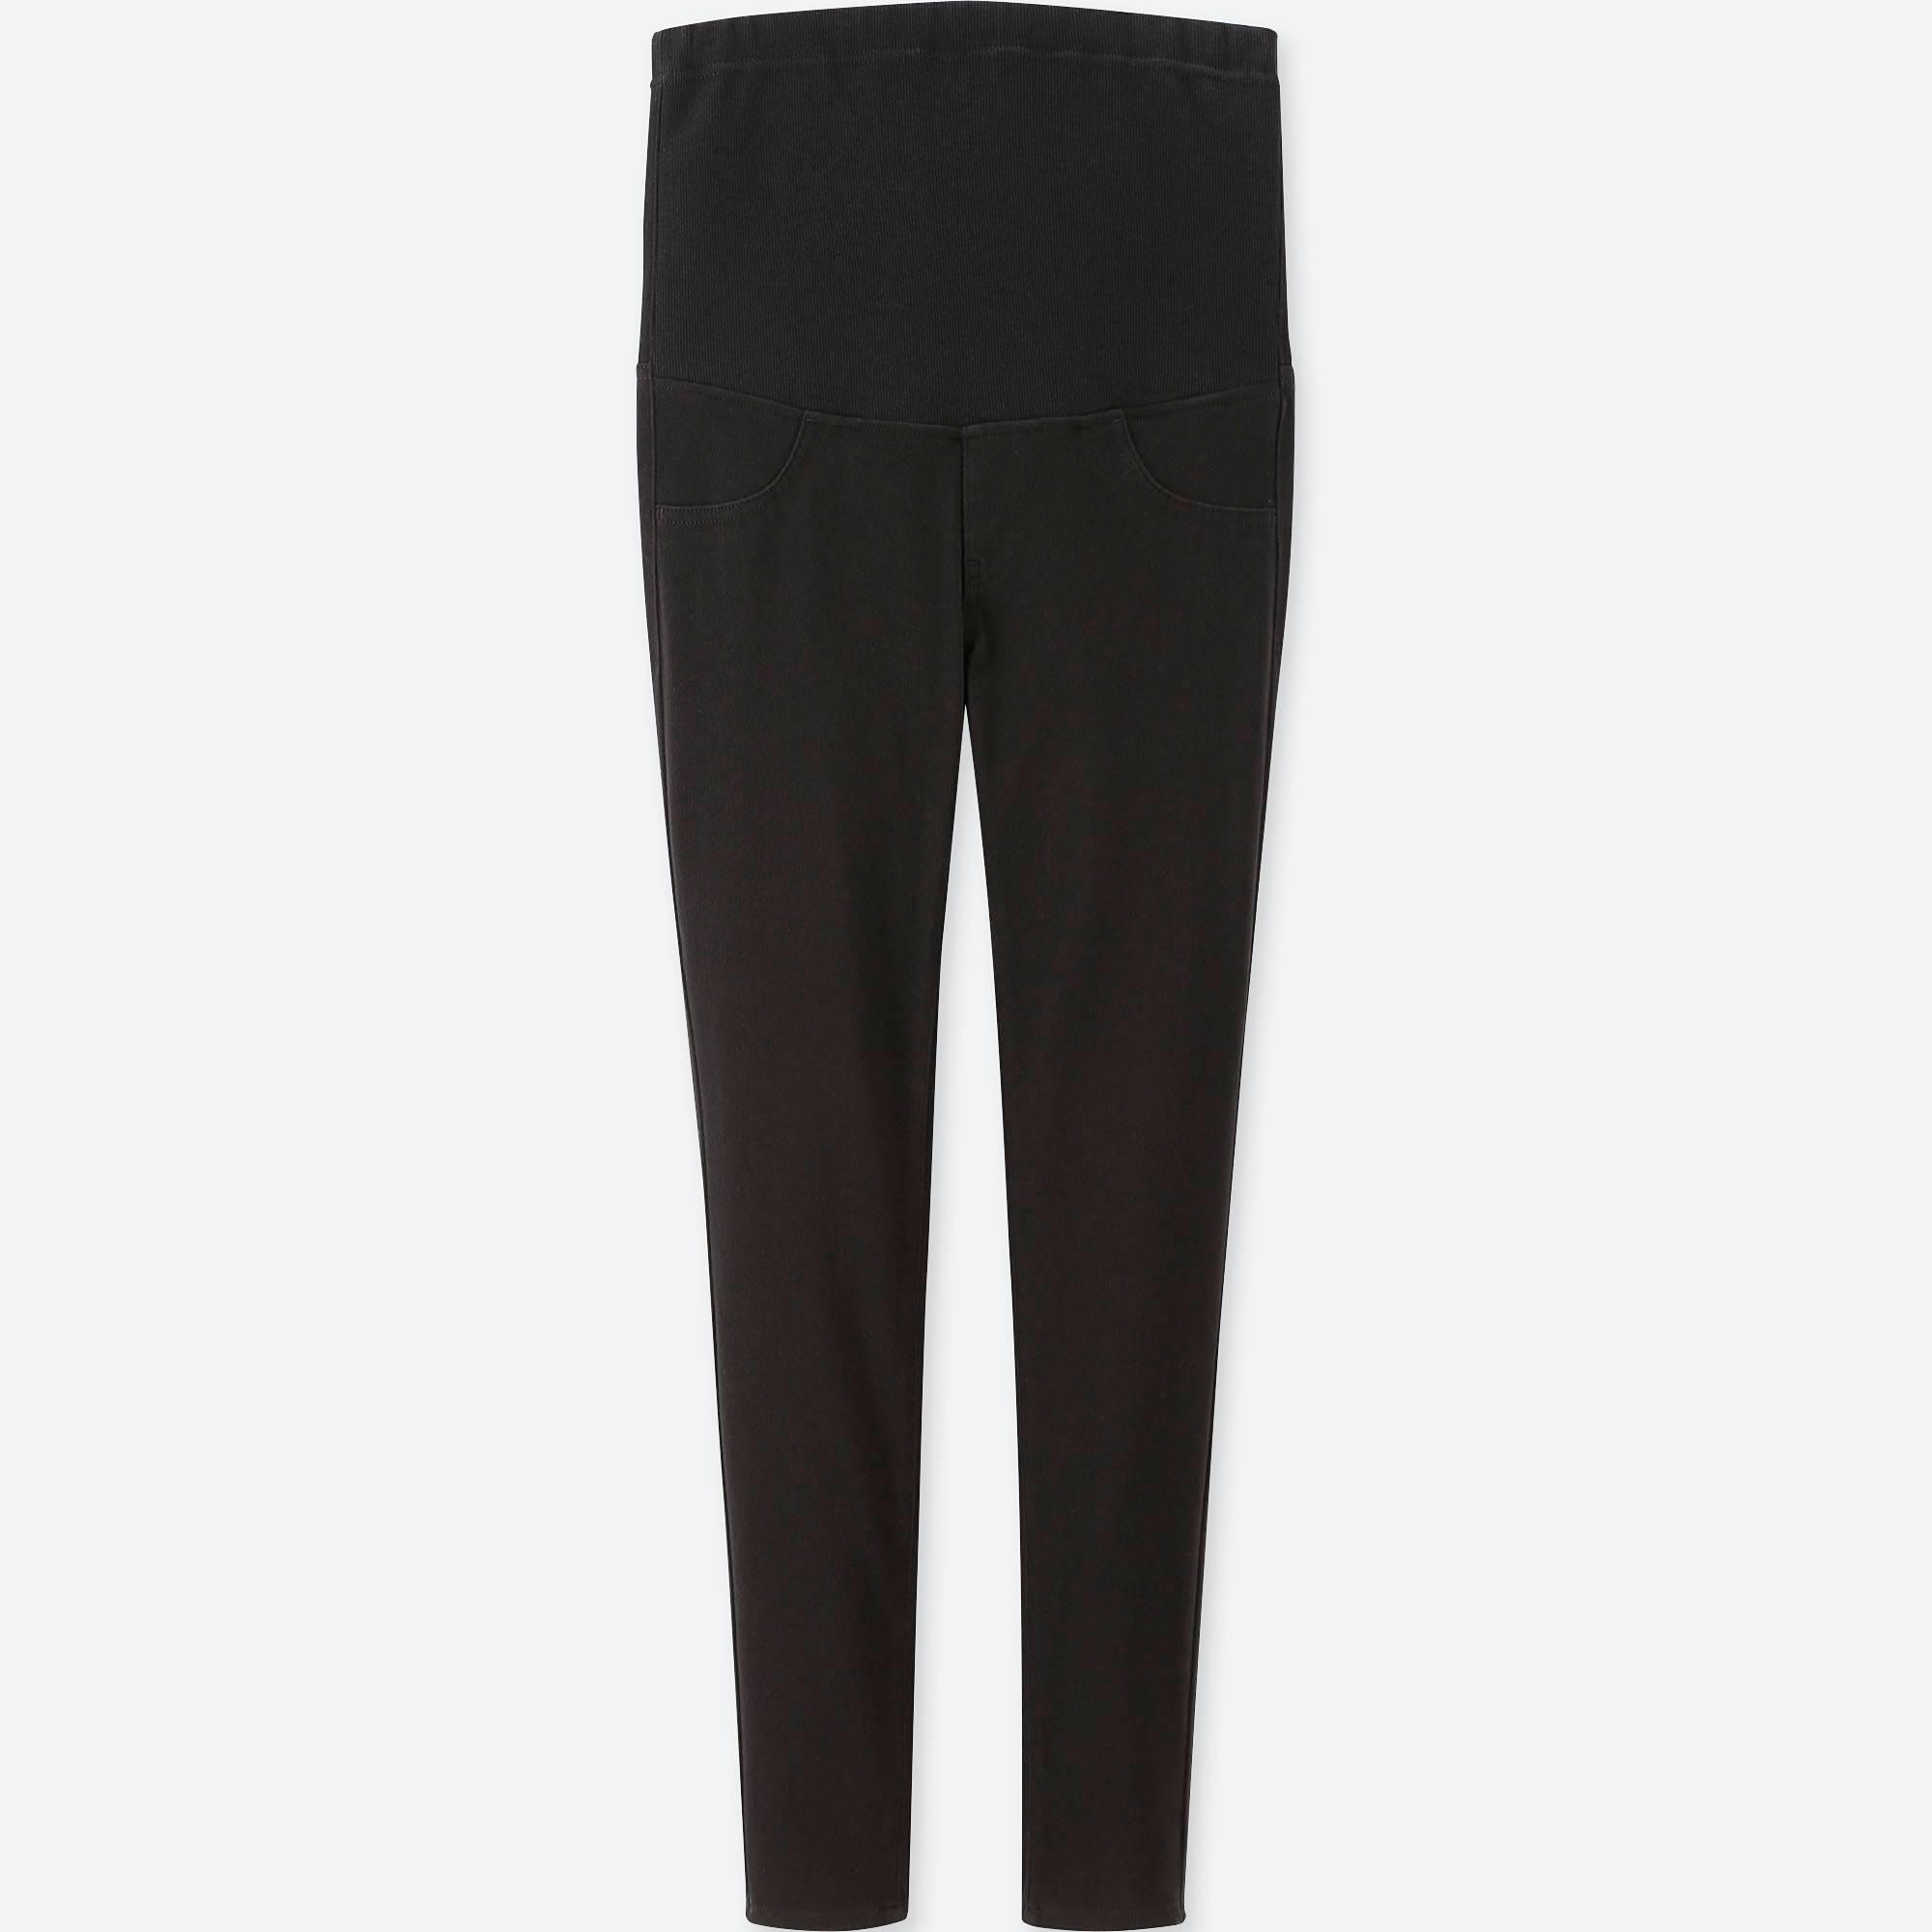 6d5f8d67e2a6c Lyst - Uniqlo Women Maternity LEGGINGS Pants in Black - Save 52%